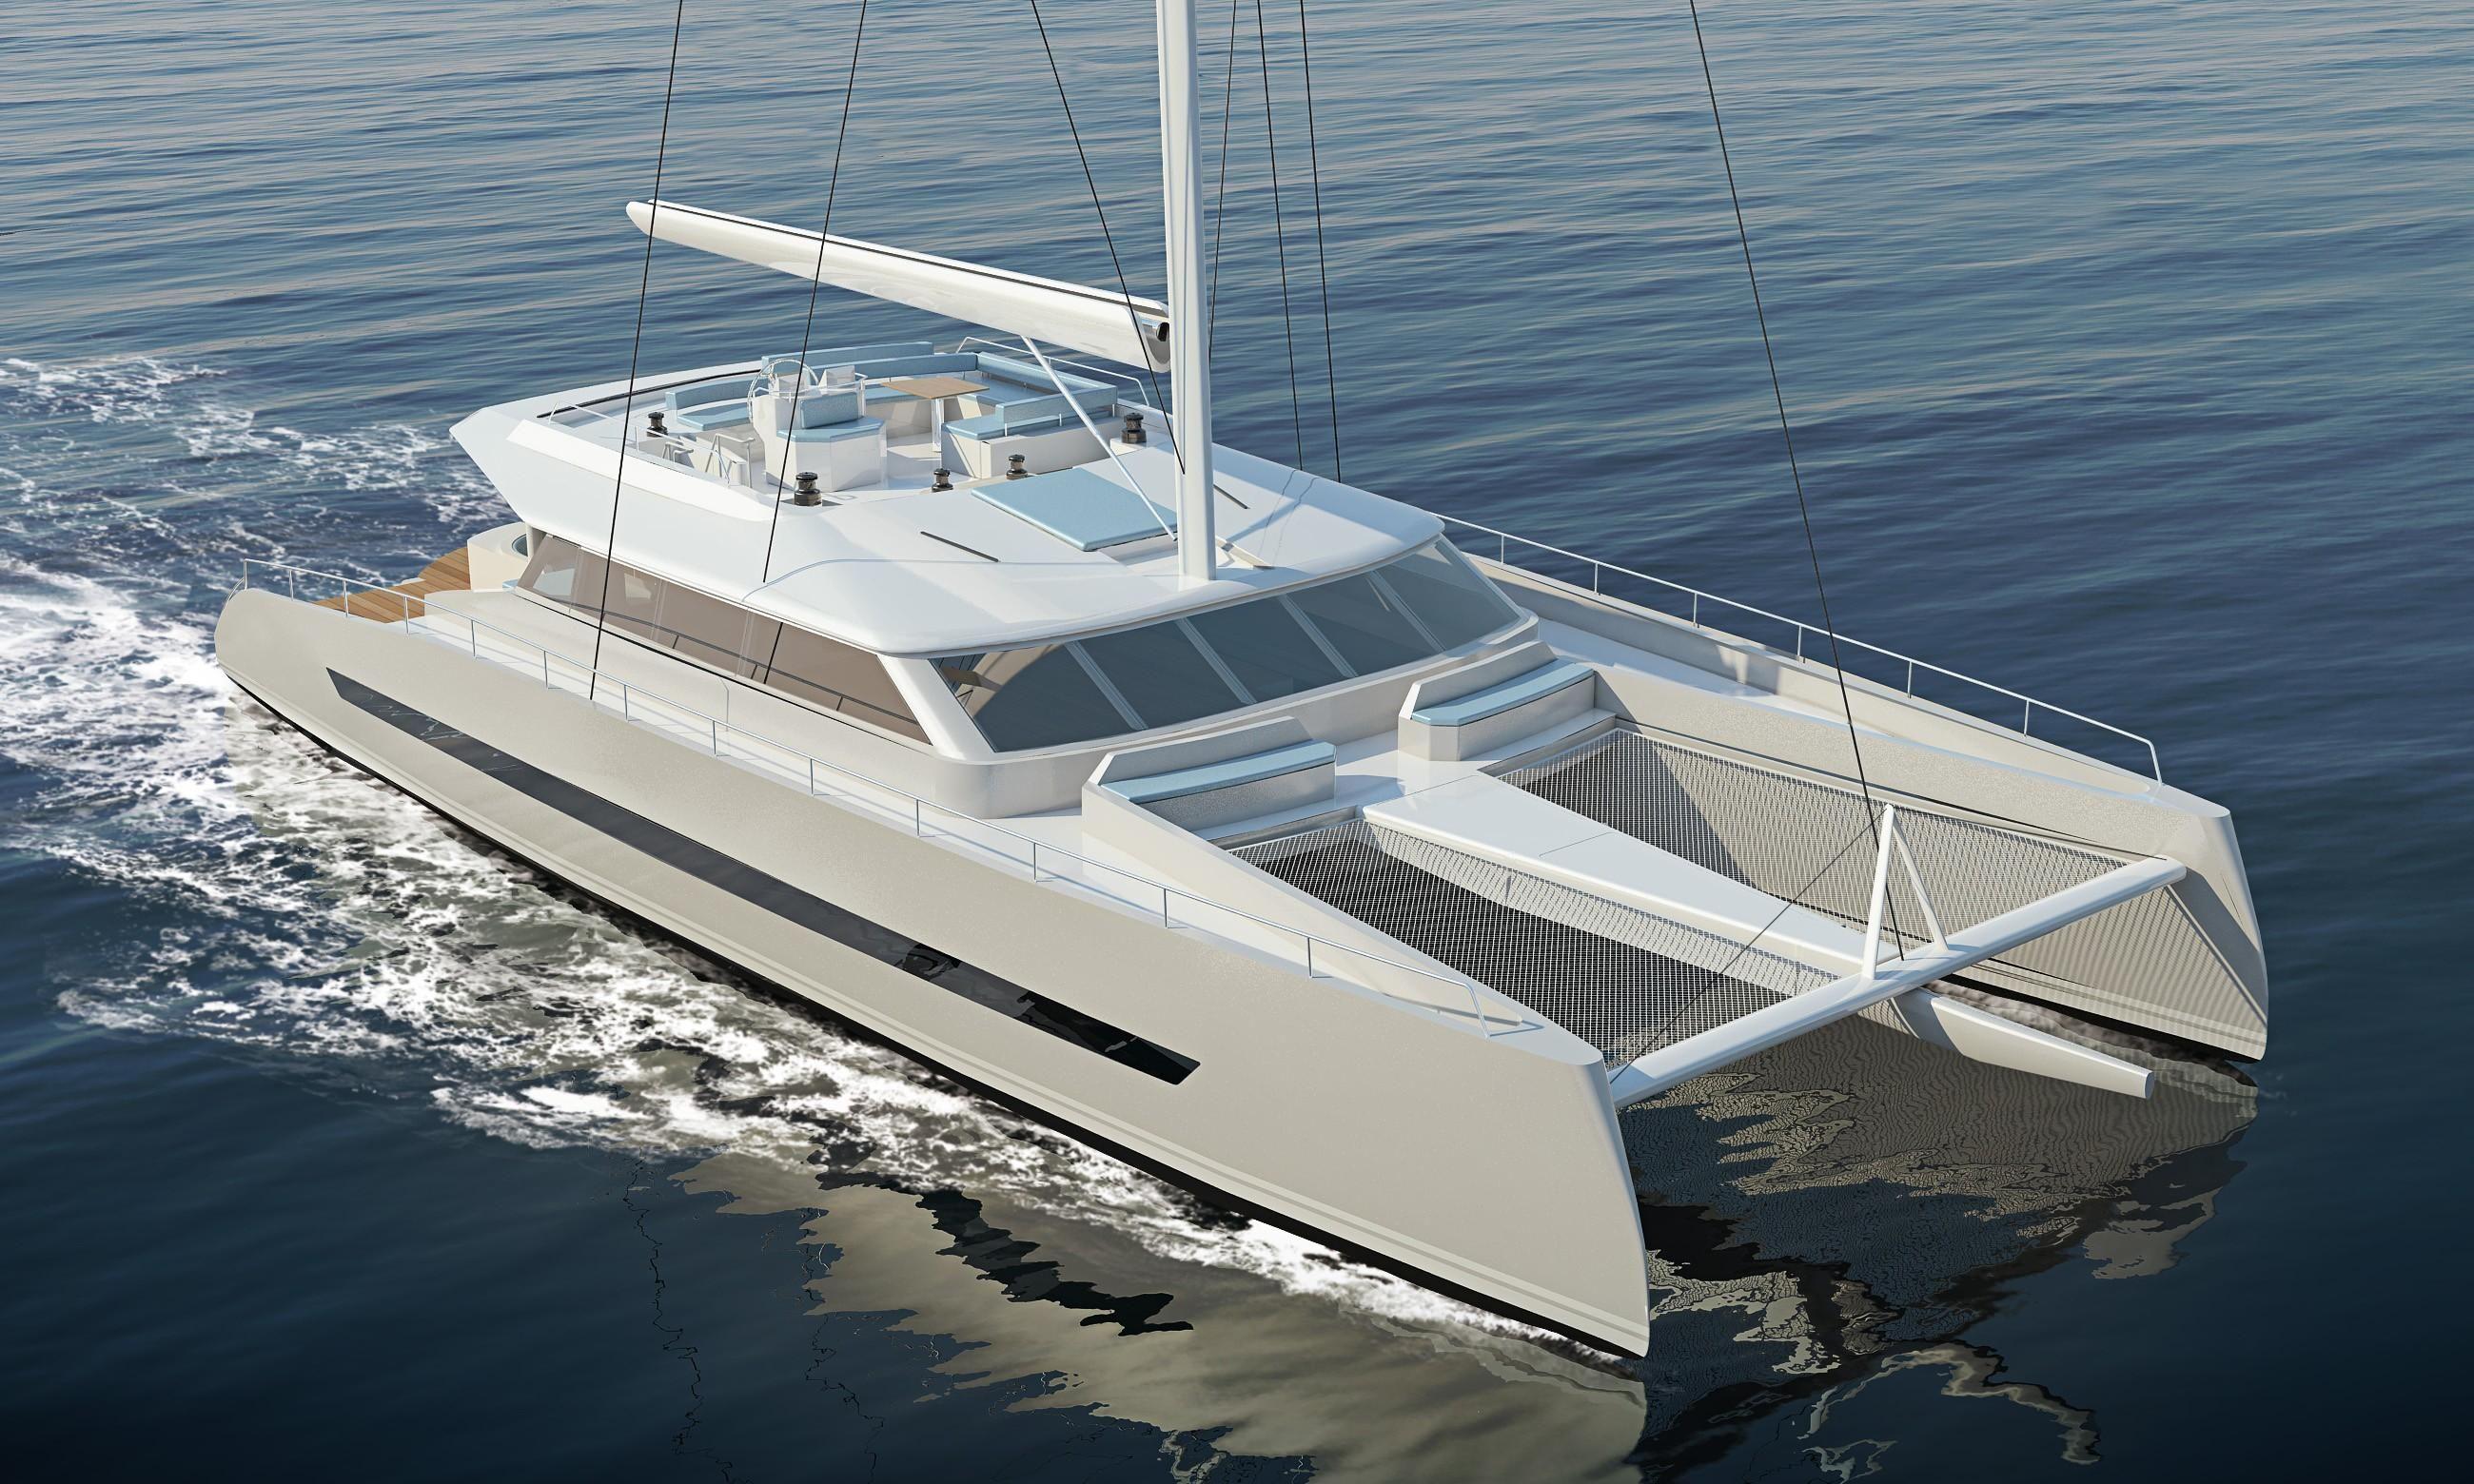 2020 Balance 760 F Sail Boat For Sale - www.yachtworld.com